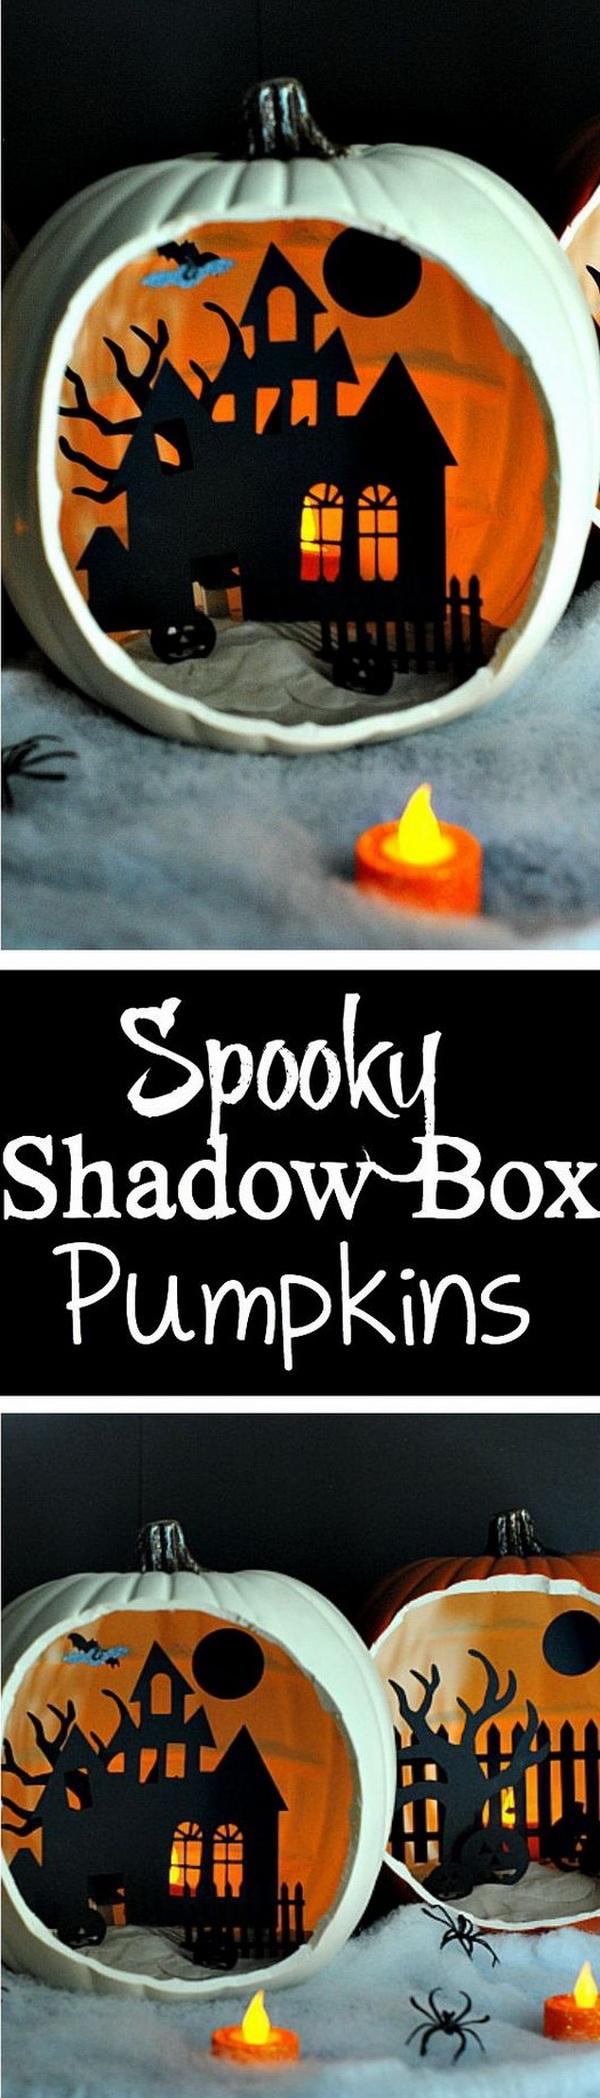 DIY Shadow Box Pumpkins.